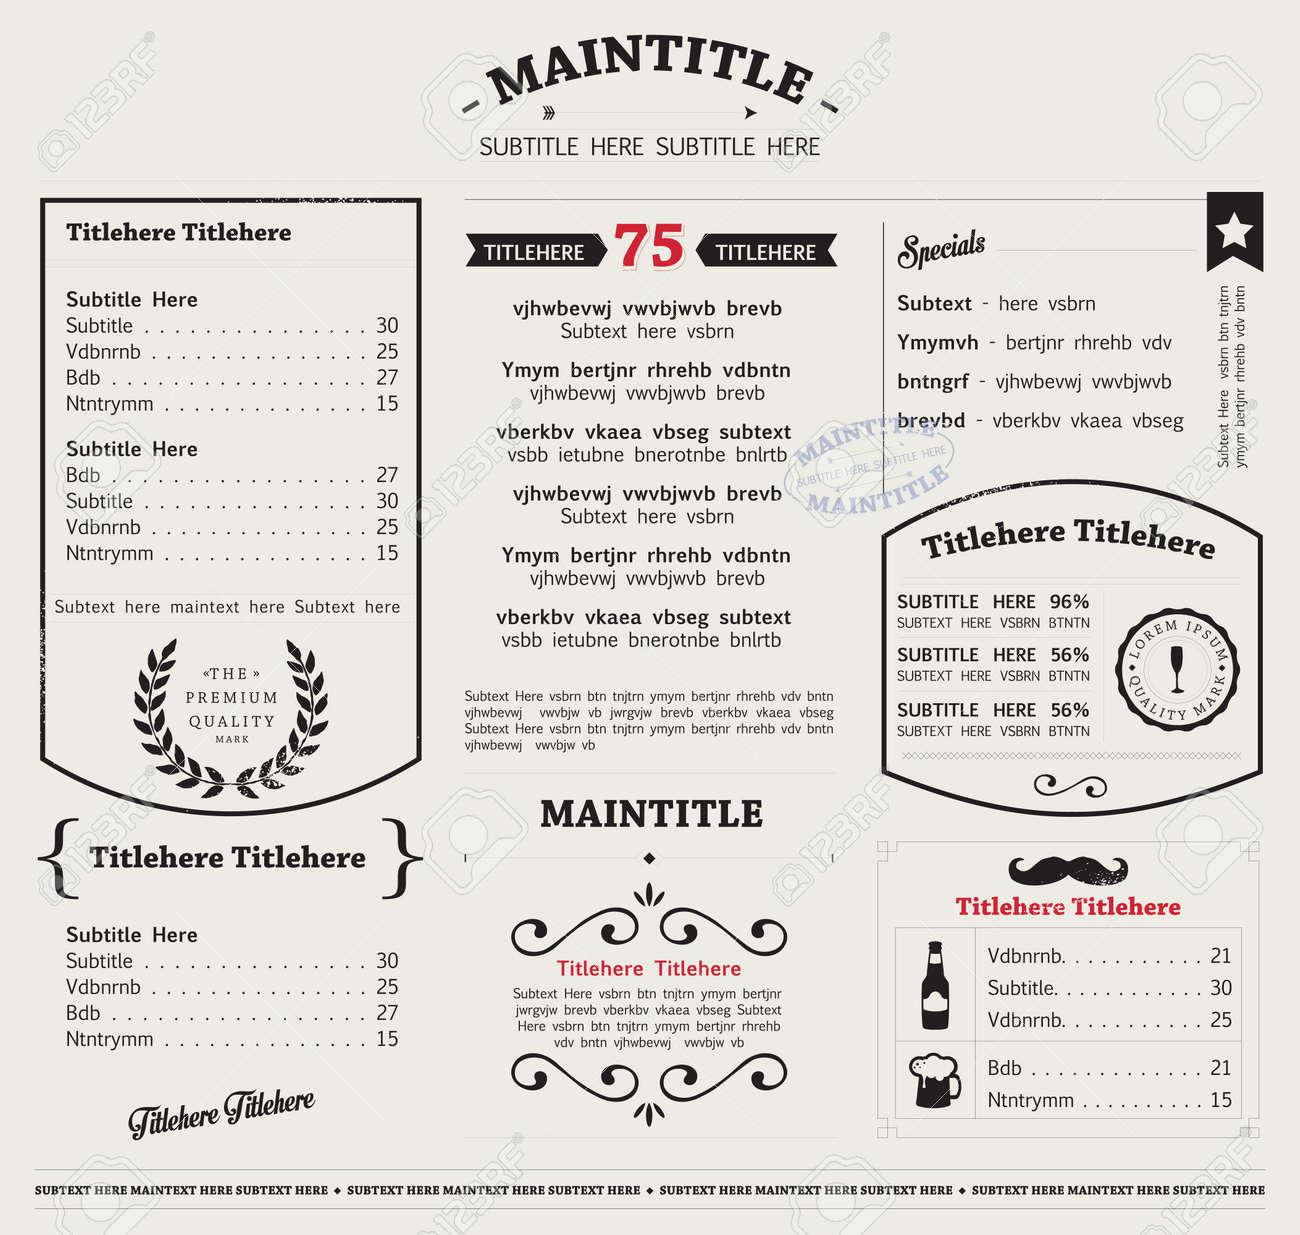 Restaurant Menu Food Design Ideas - 155537176